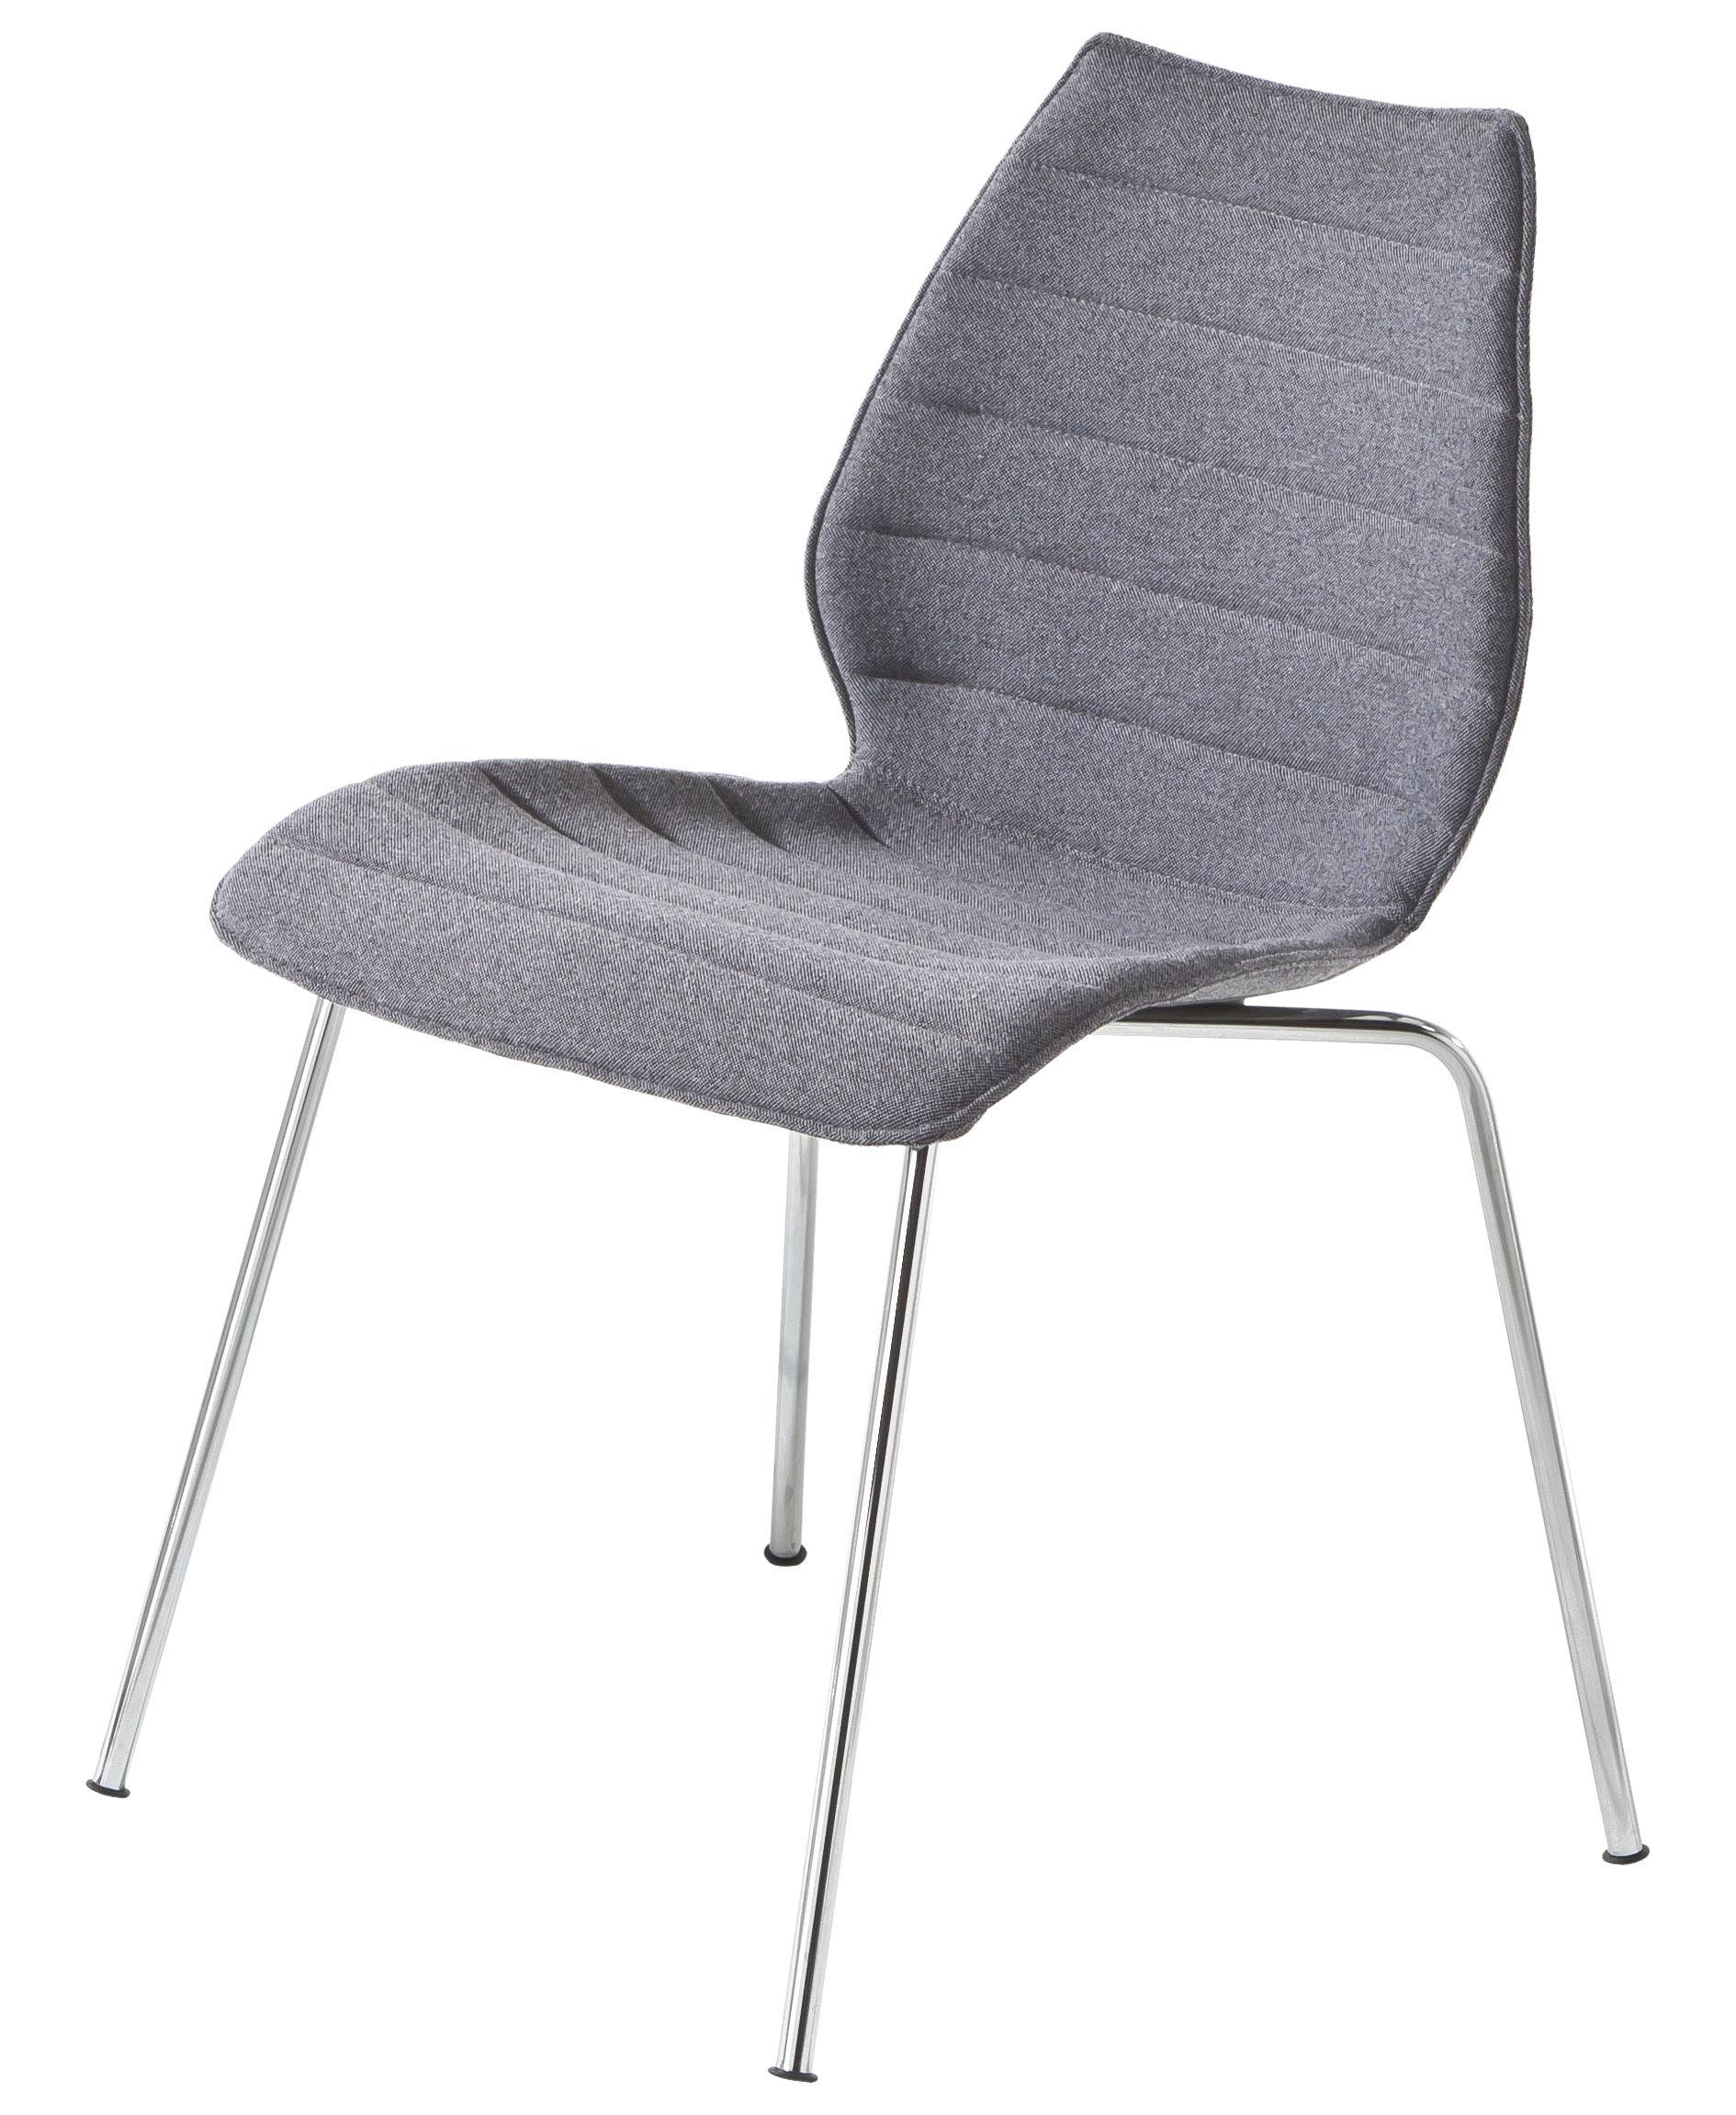 Möbel - Maui Soft Gepolsterter Stuhl /Trevira-Stoff - Kartell - Grau - Polypropylen, Stahl, Tissu Trevira